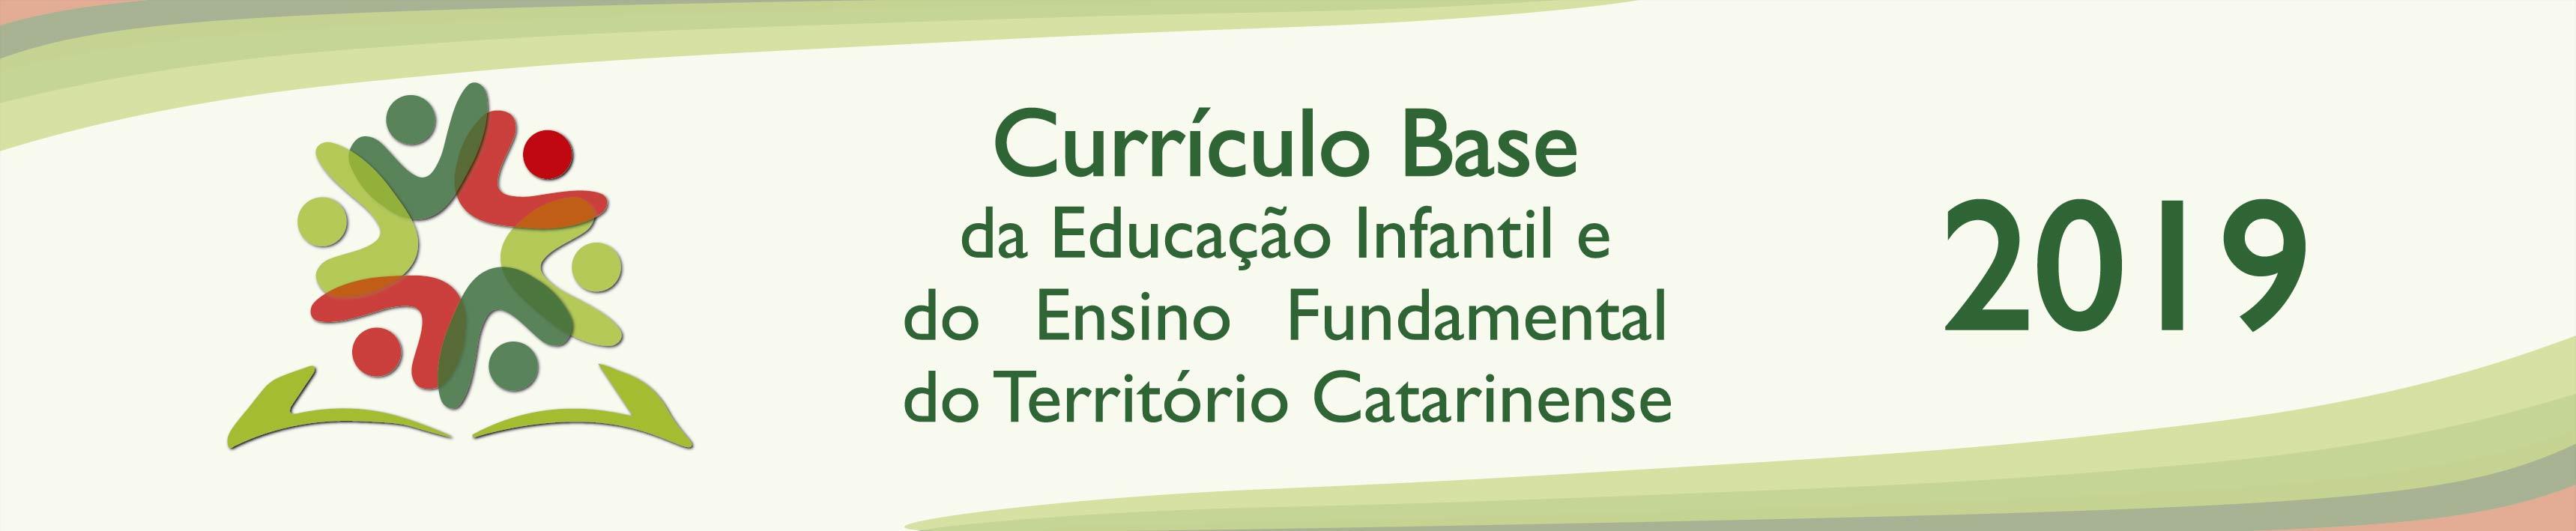 Currculo_Base_SC_2019_Banner_Prancheta_1